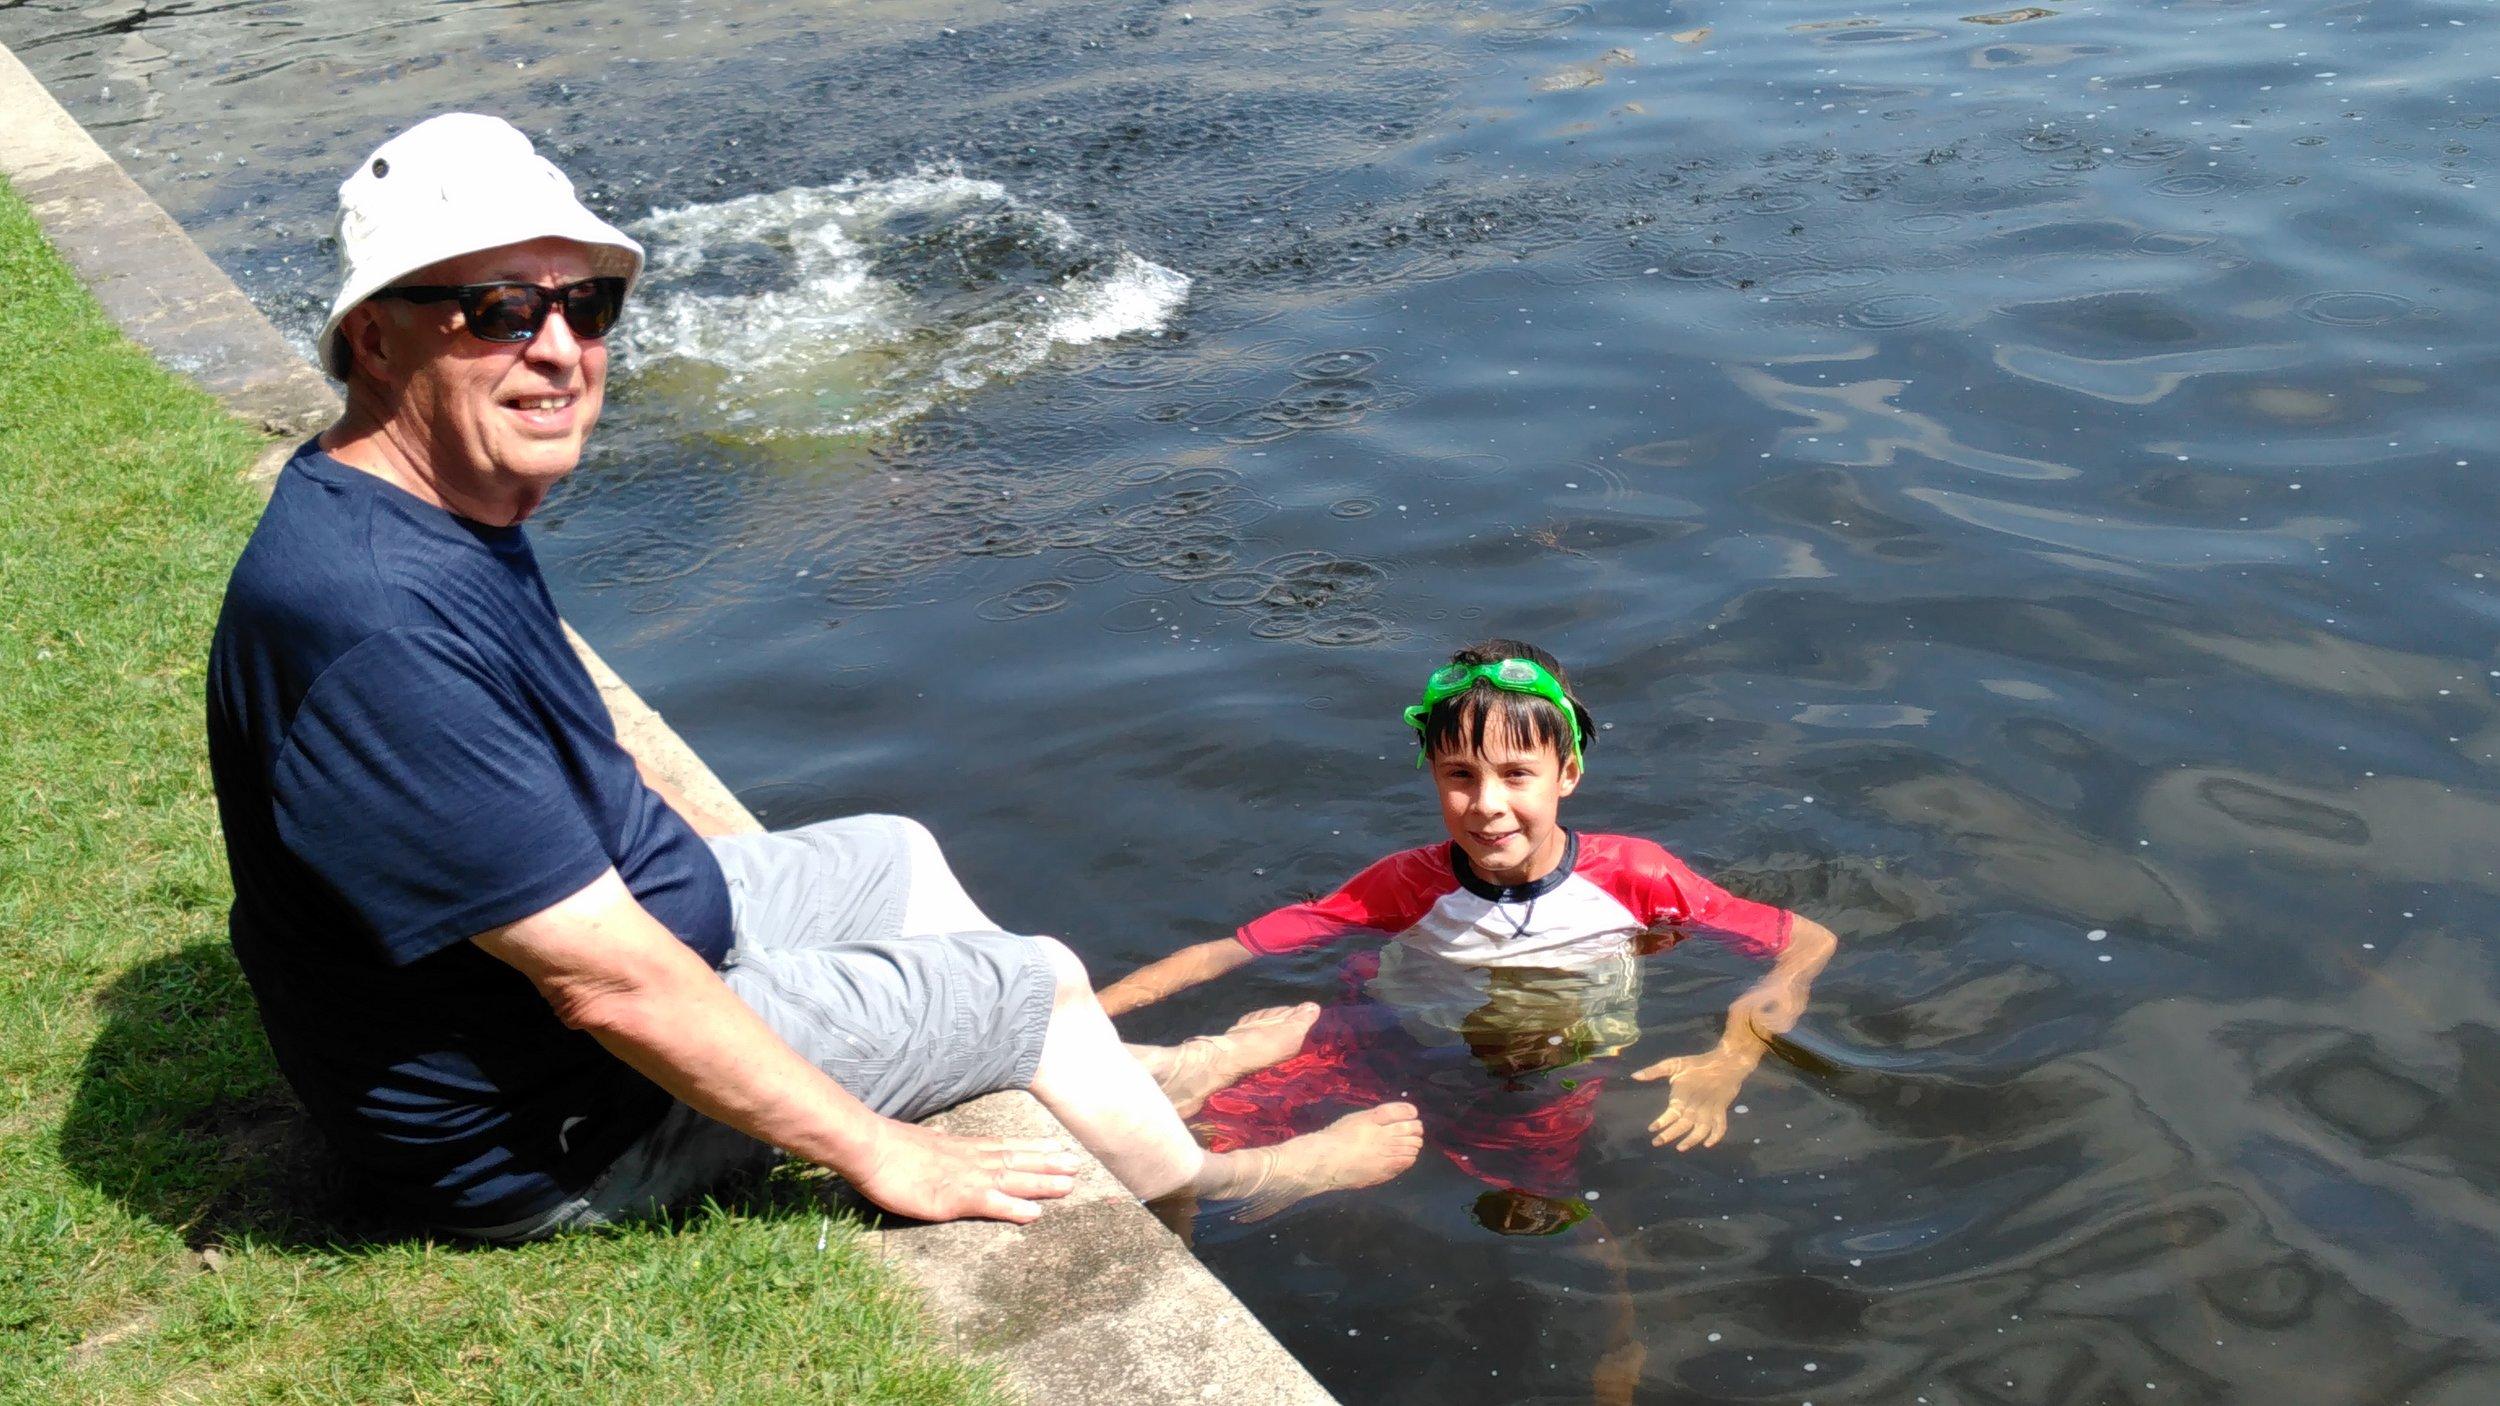 Swimming Area - Rideau Canal locks